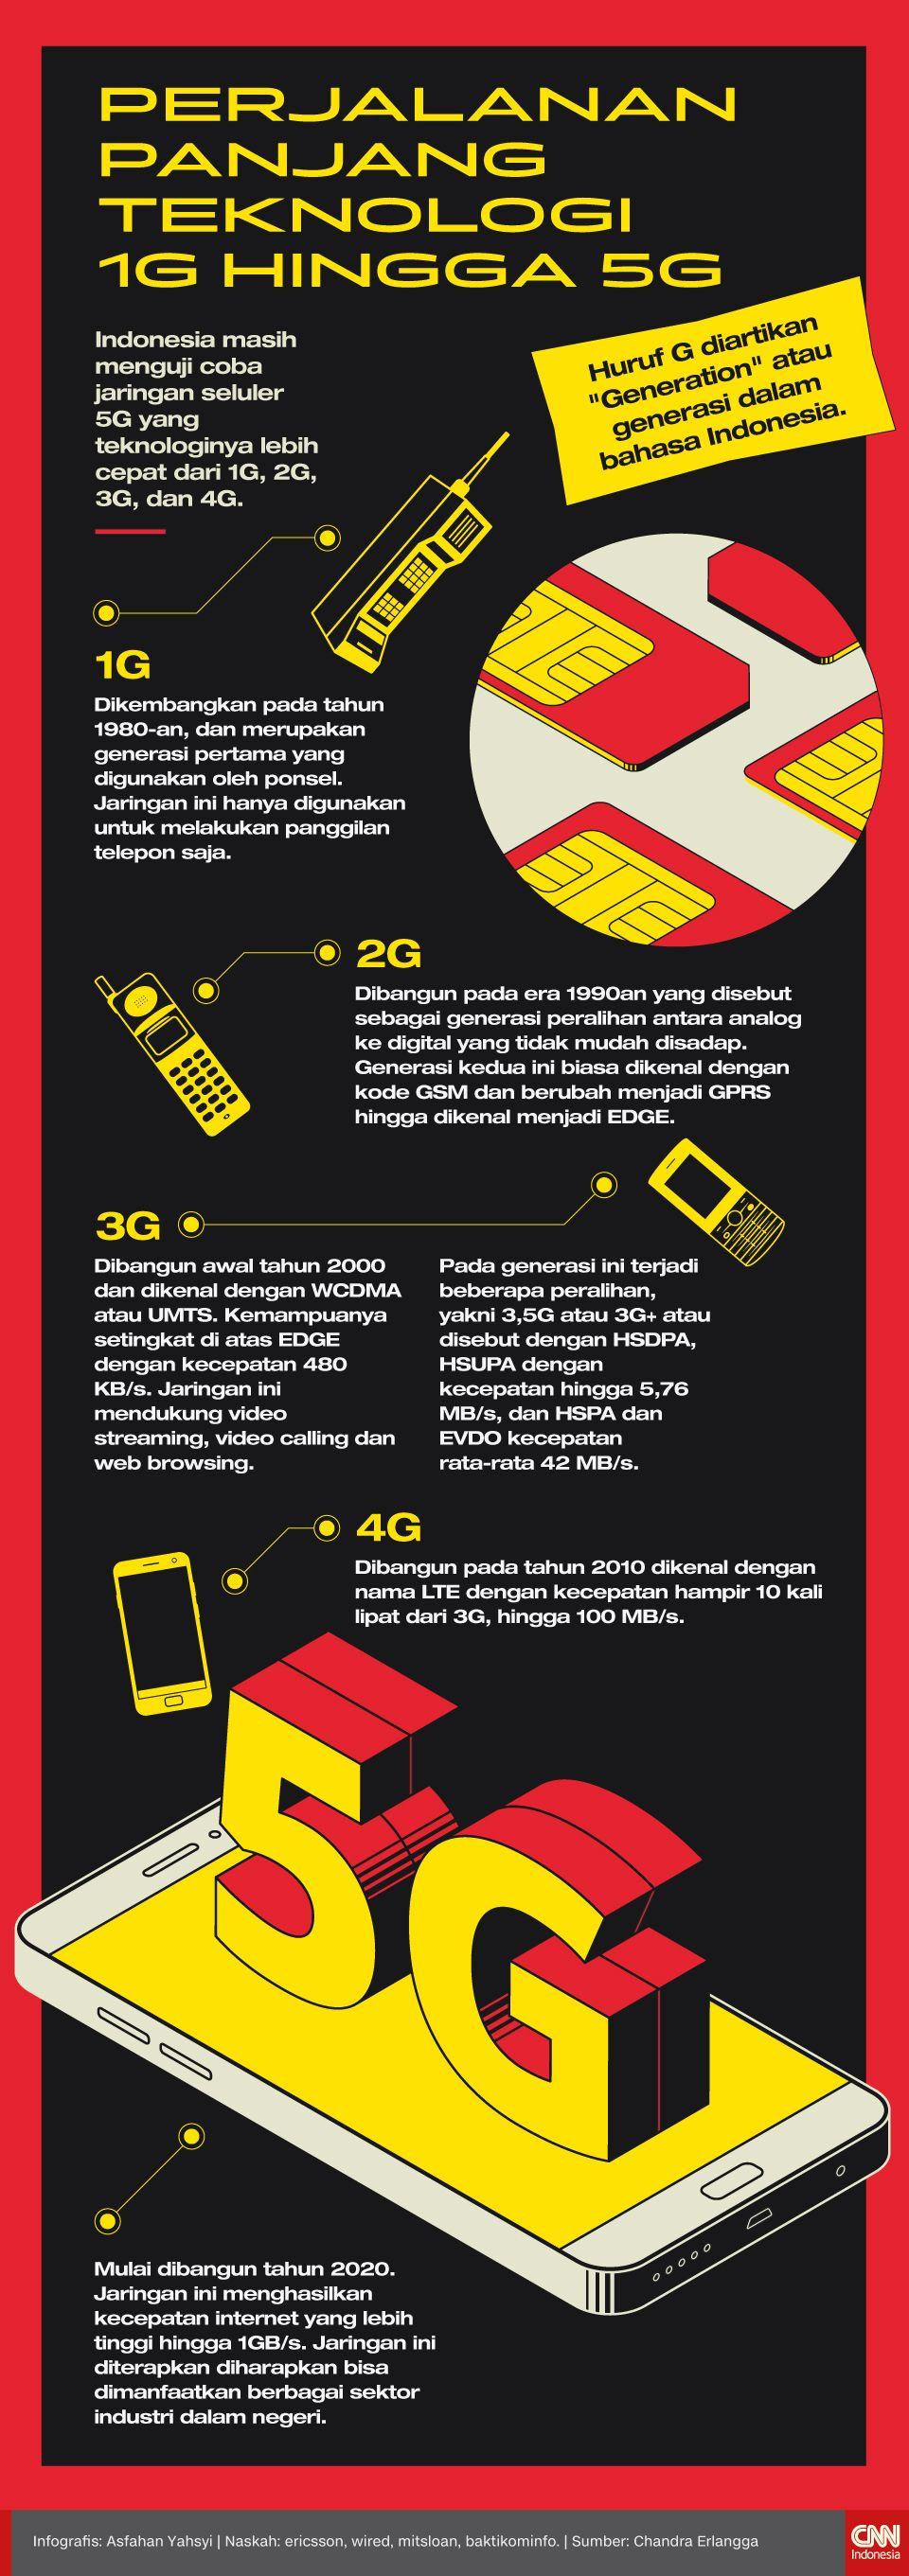 Infografis Perjalanan Panjang Teknologi 1G Hingga 5G